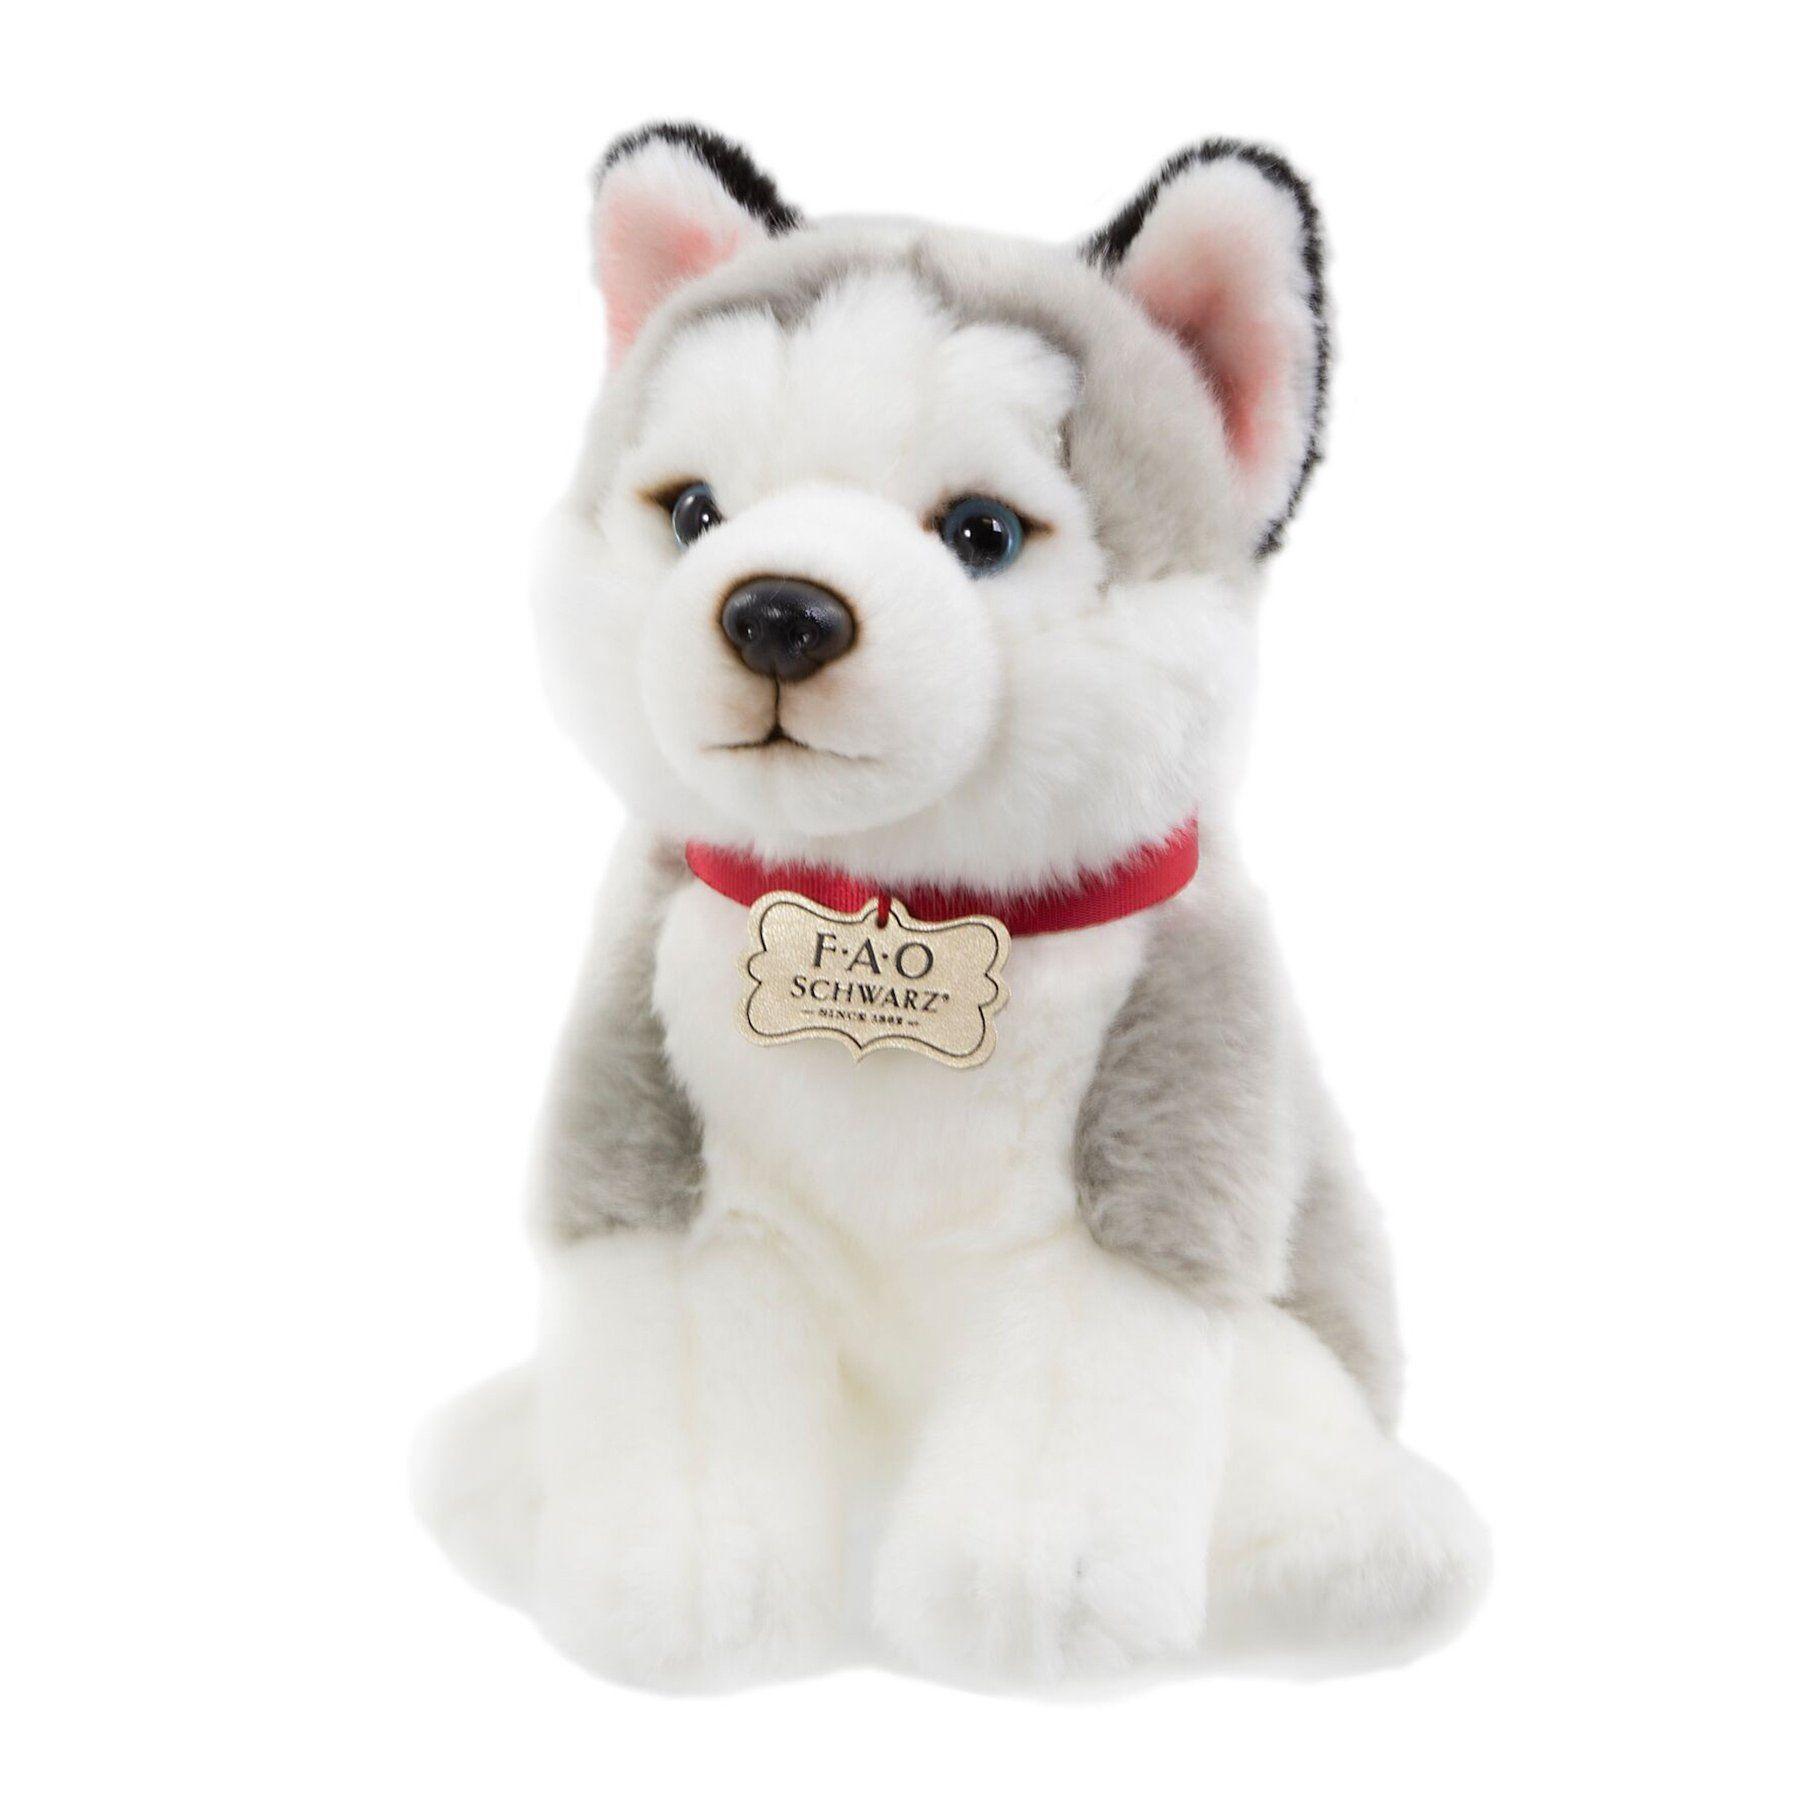 Plush Husky Puppy FAO Schwarz Pet toys, Plush stuffed